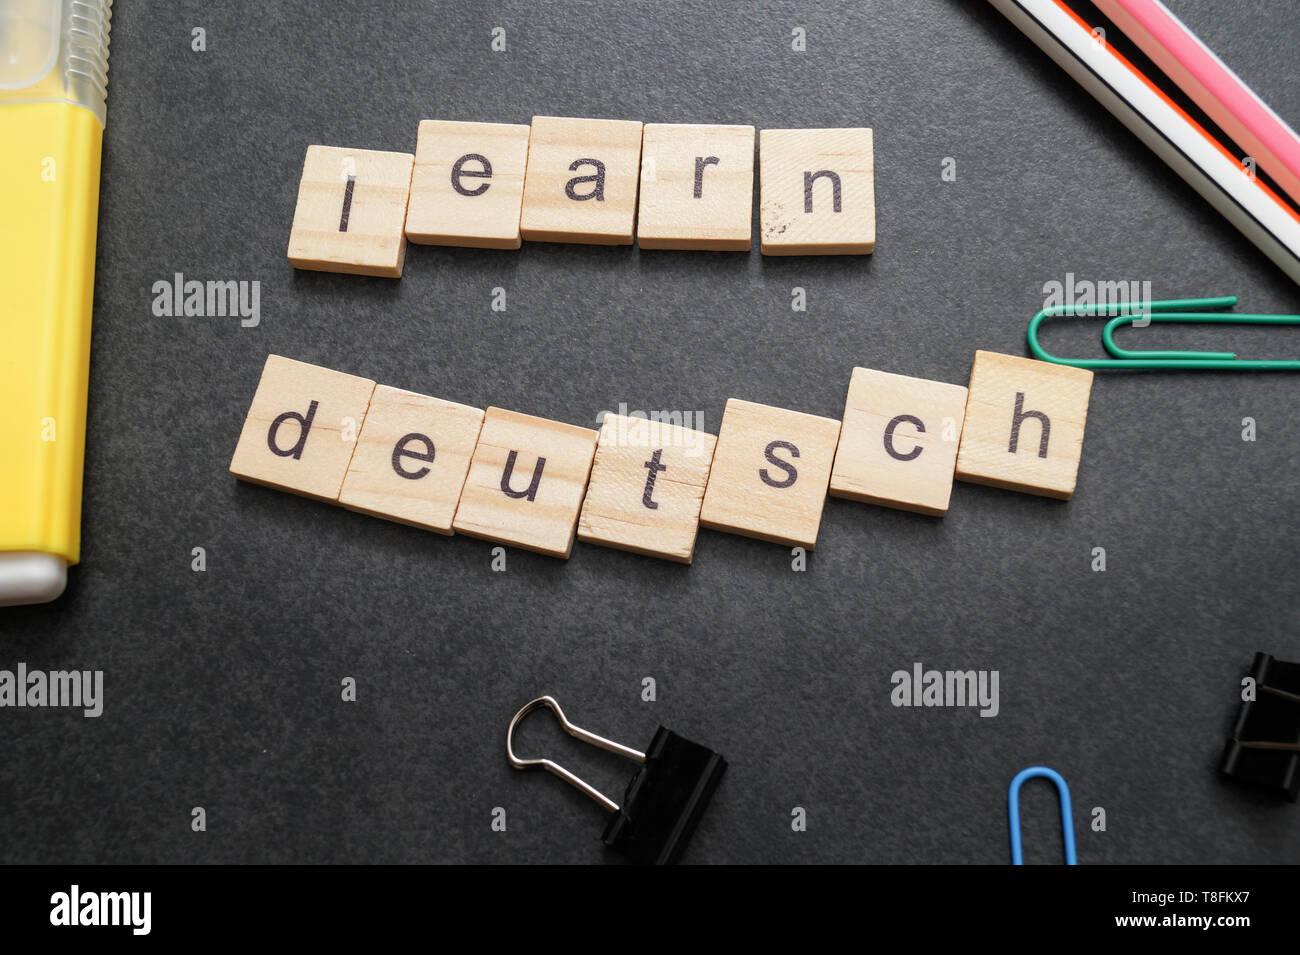 Word LEARN DEUTSCH written on wood block. Close up - Stock Image